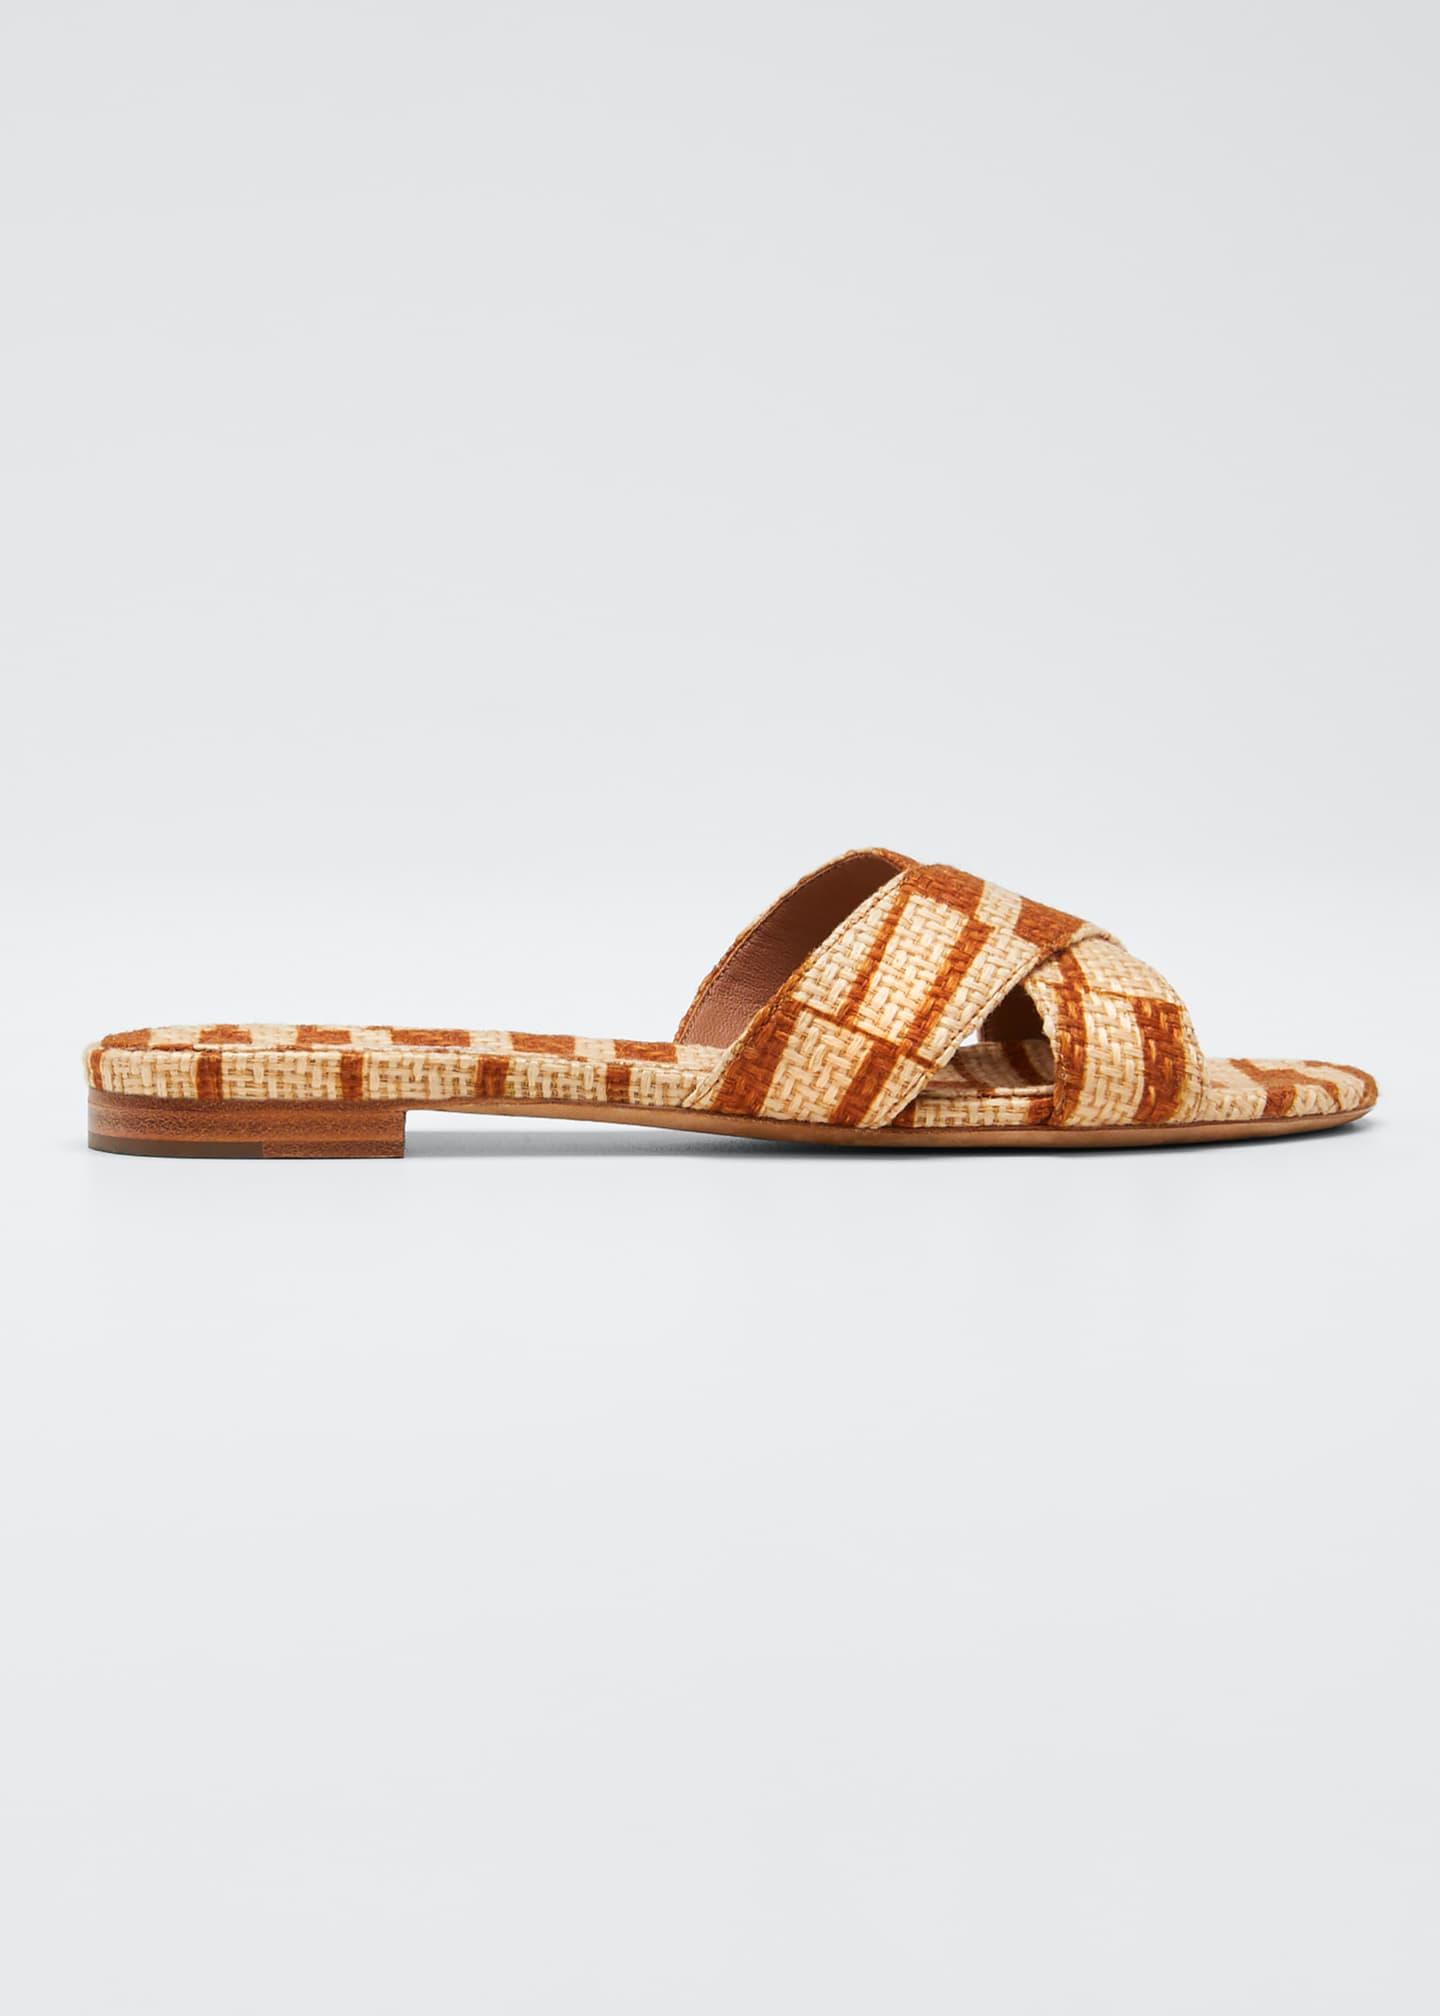 Tabitha Simmons Lassie Two-Tone Raffia Sandals